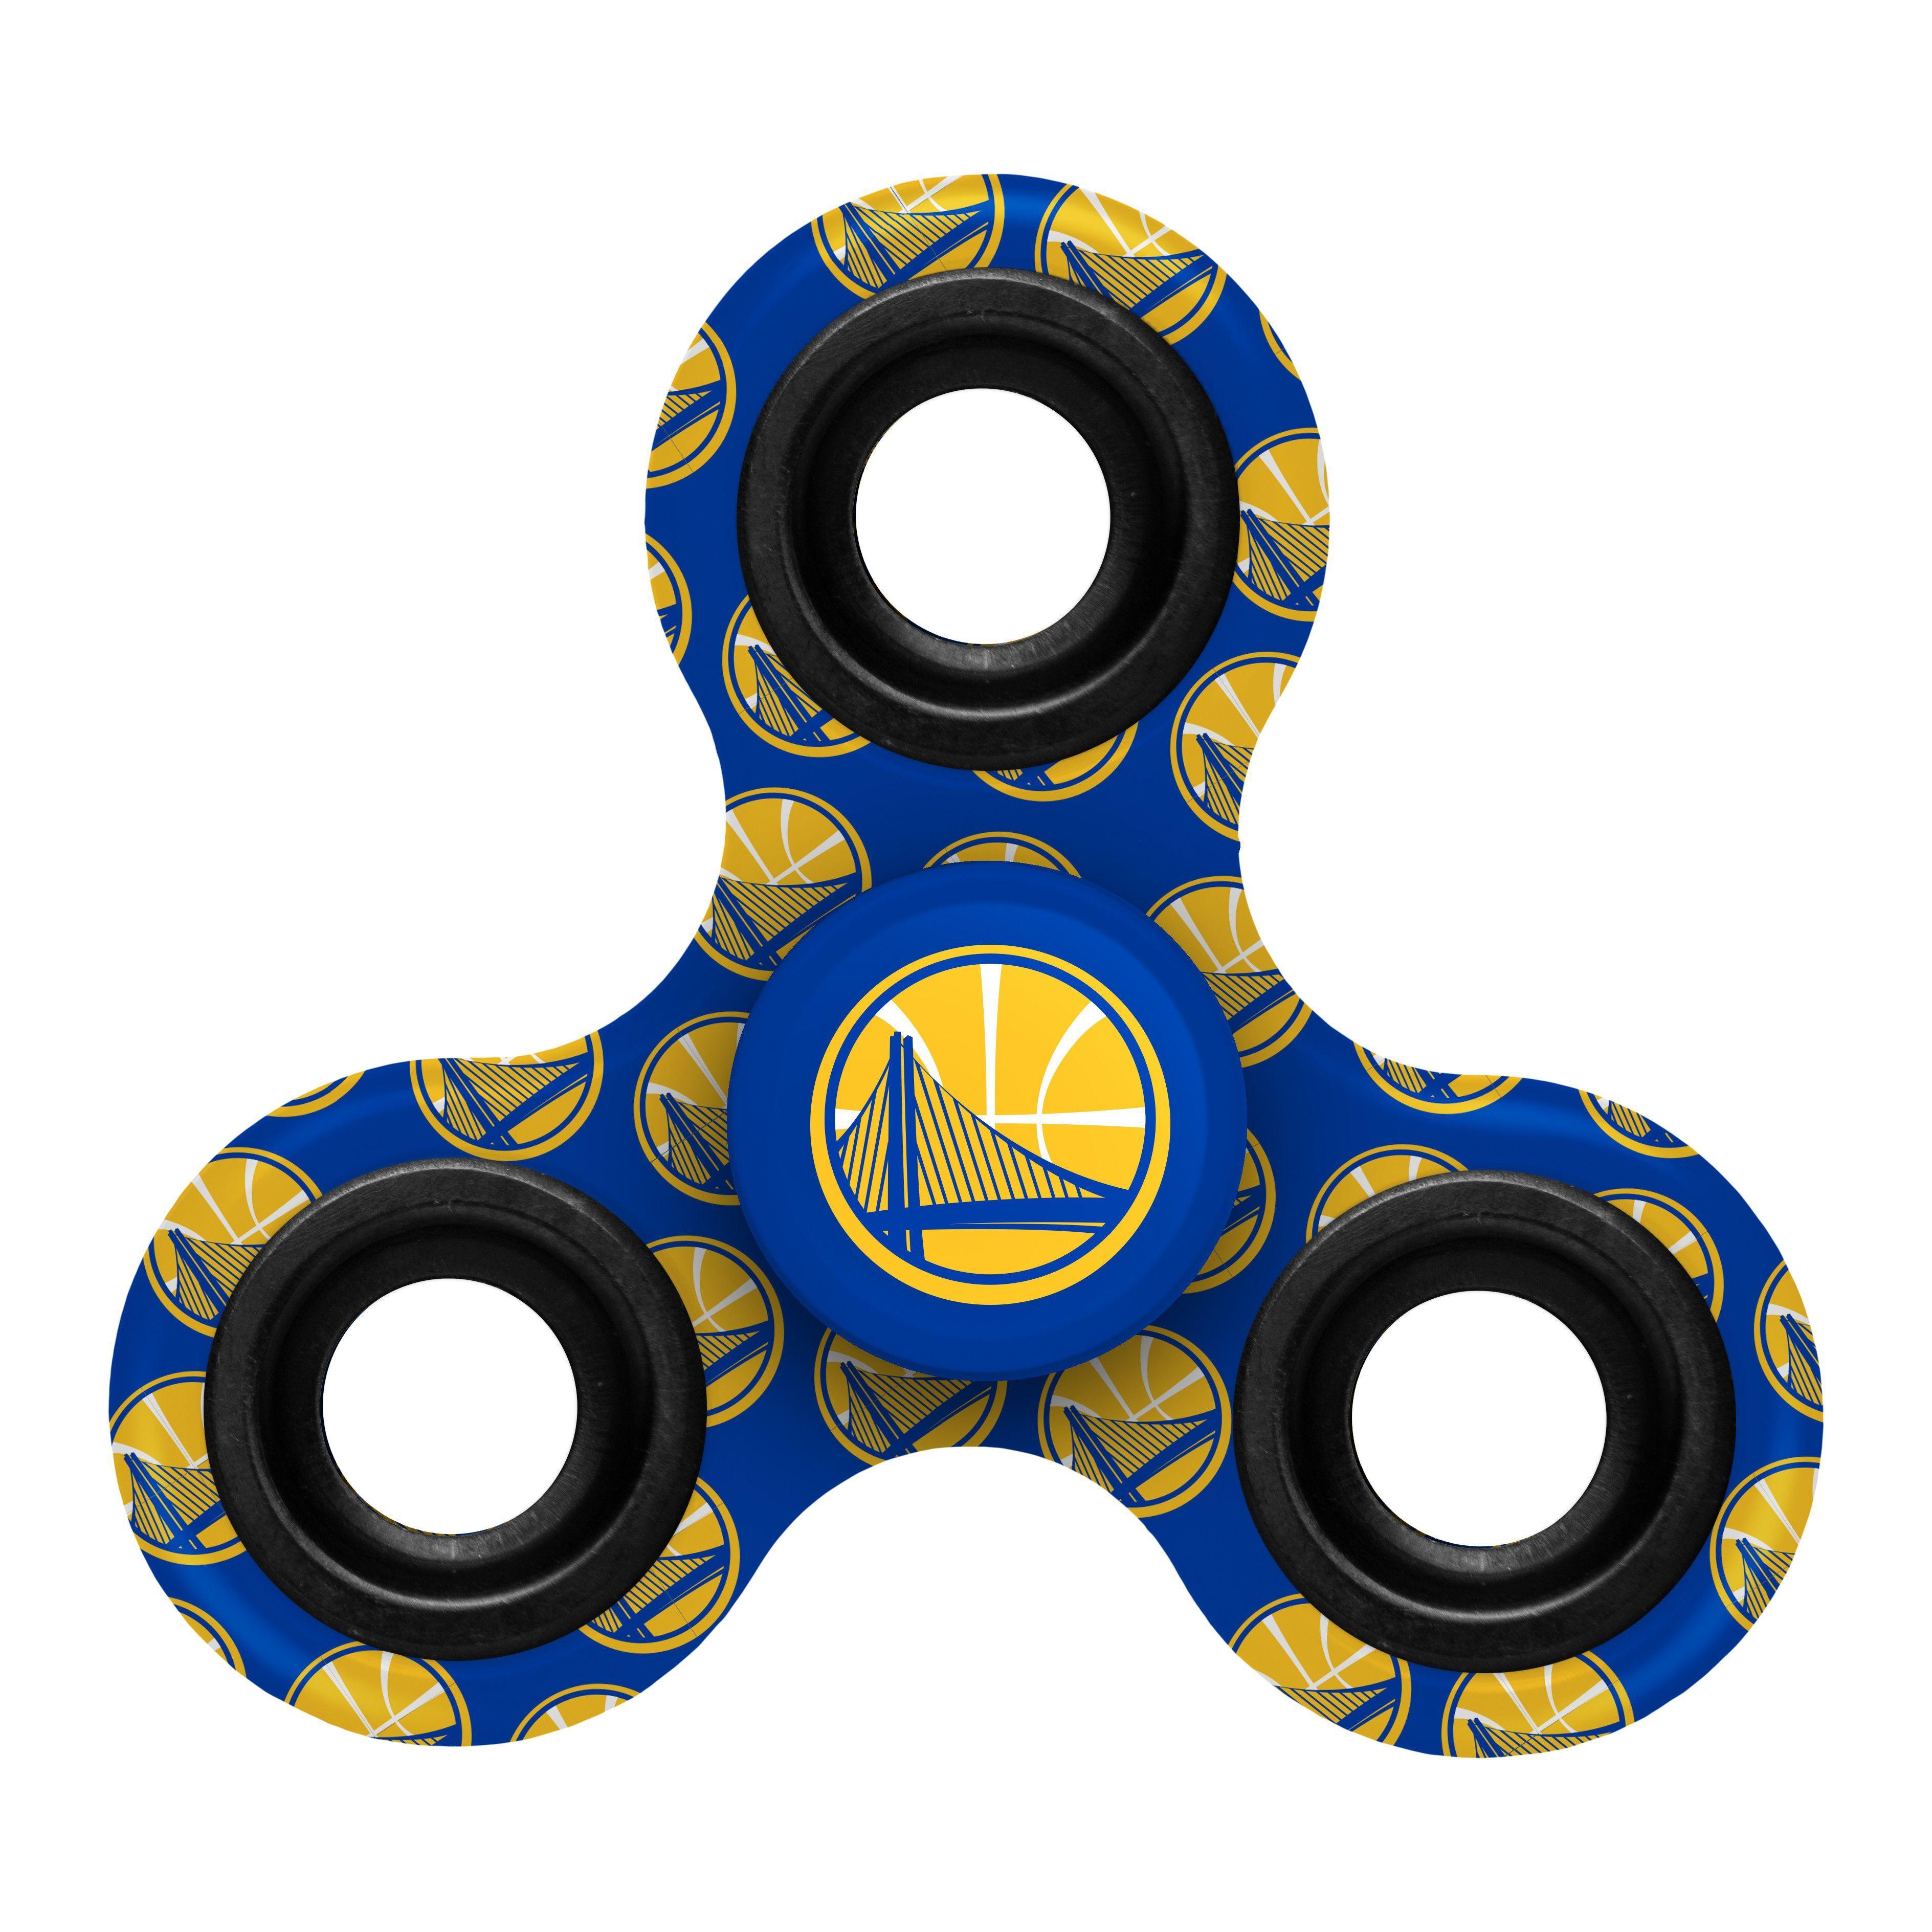 Golden State Warriors Nba Fidget Diztracto Spinner Three